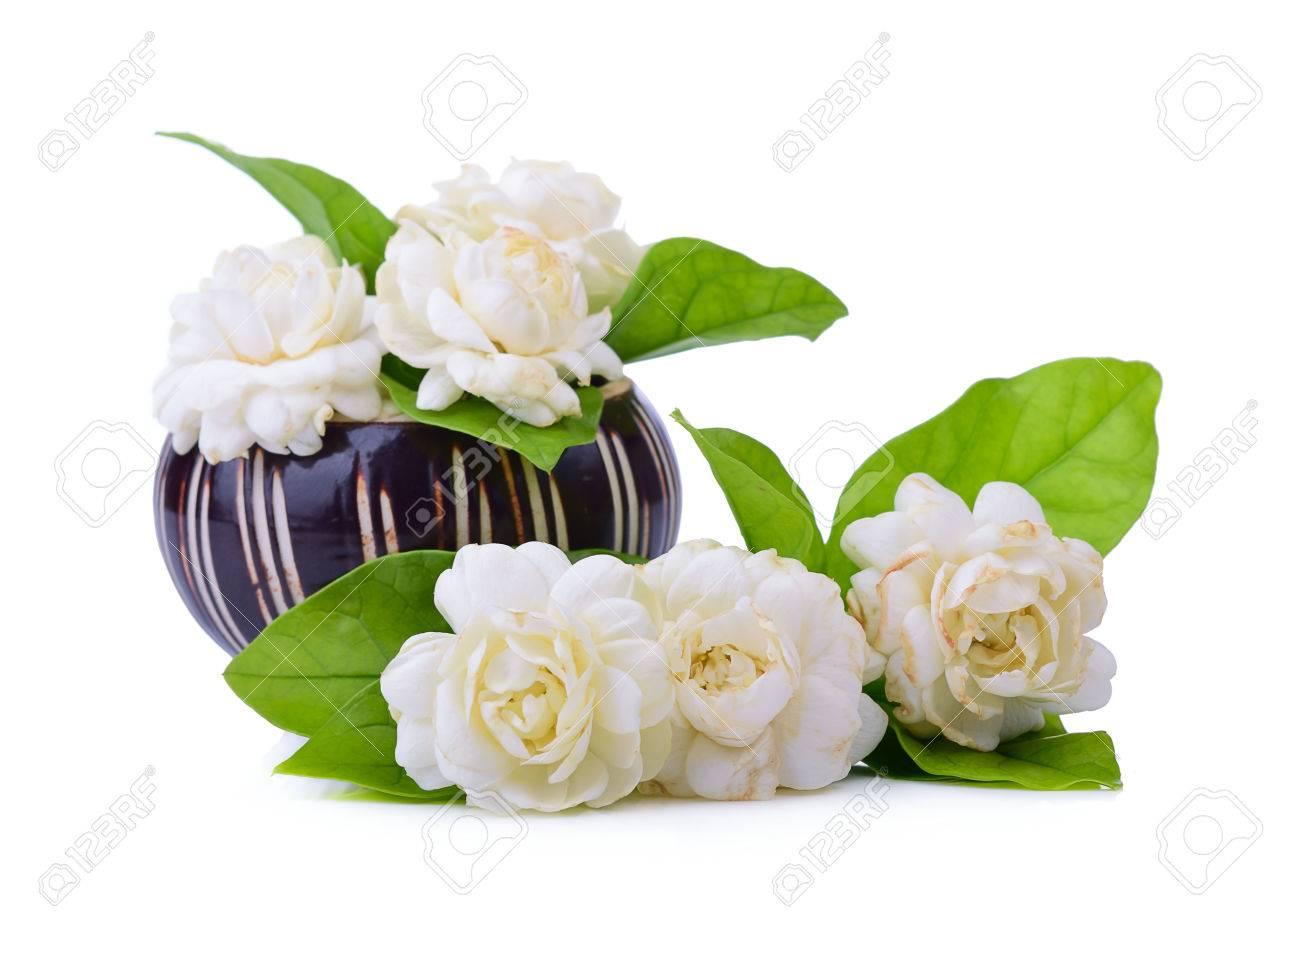 Jasmine flower fragrance isolated on white background stock photo jasmine flower fragrance isolated on white background stock photo 71620669 mightylinksfo